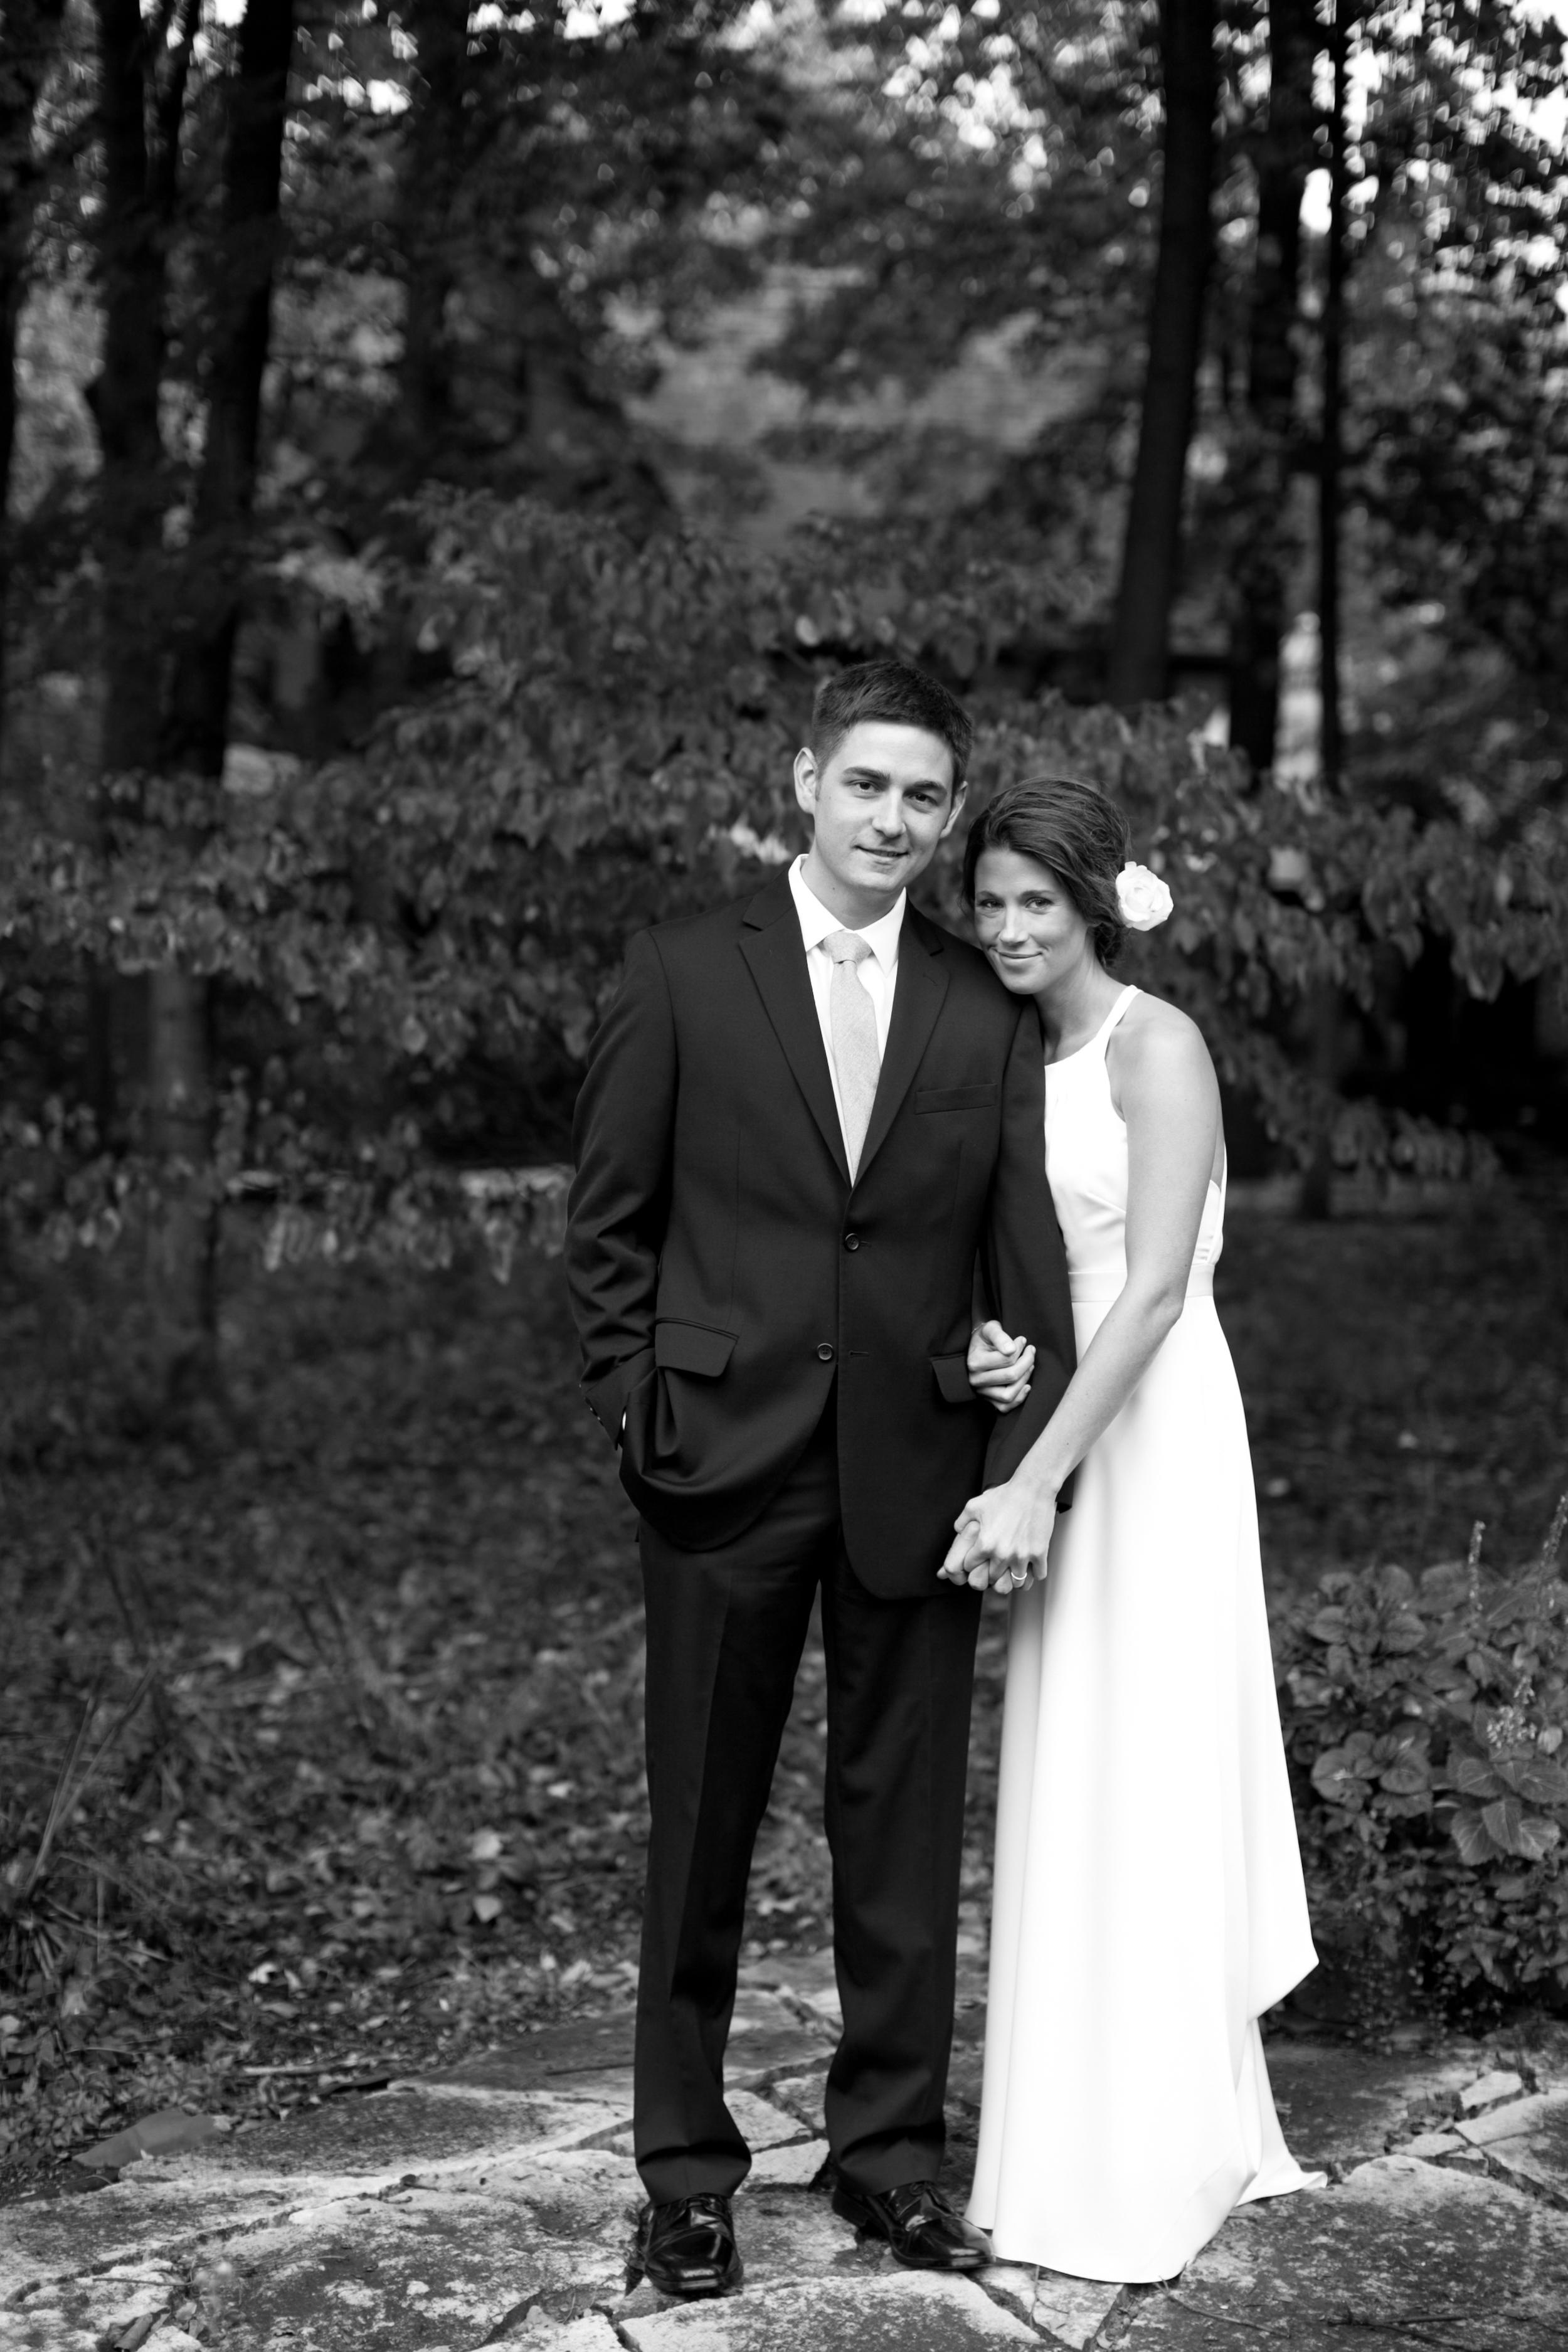 WASB wedding, 2012, Olin Park in Madison.